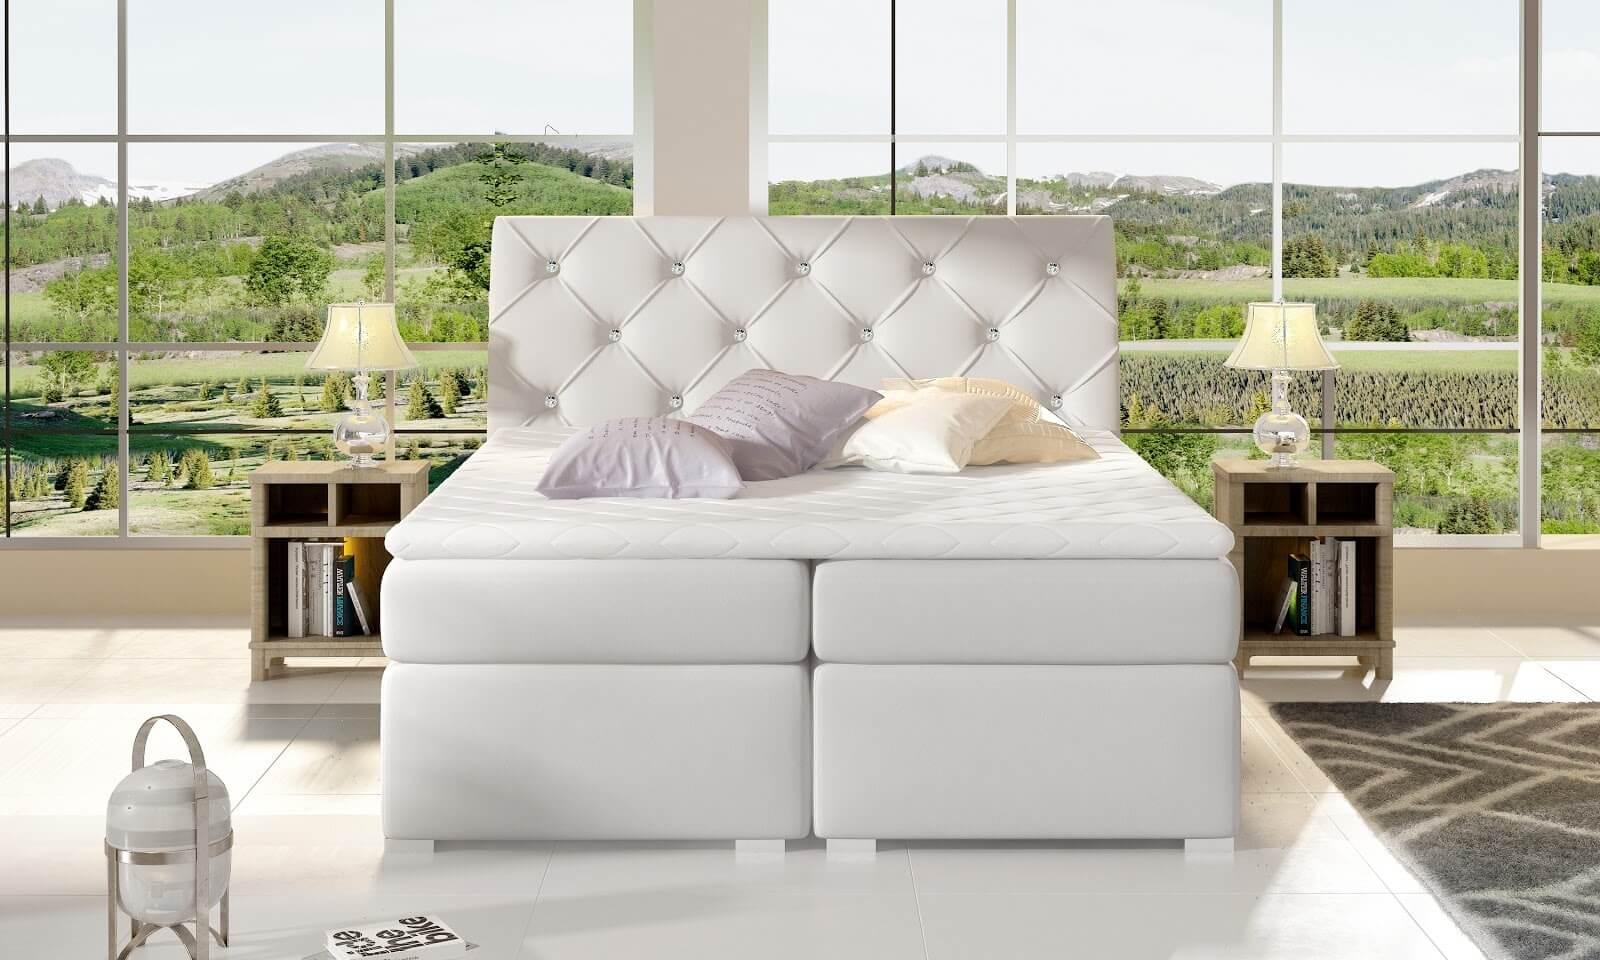 Łóżko box spring Balvin Eltap w stylu glamour